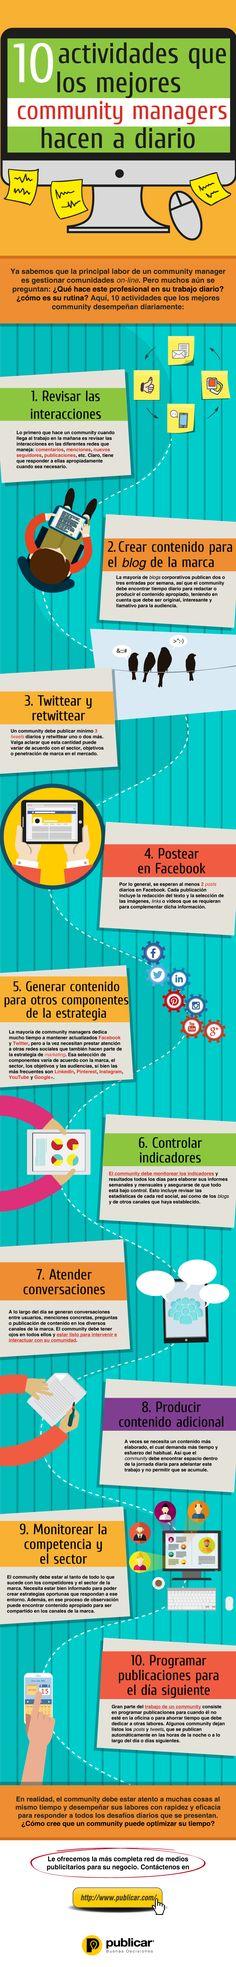 10 actividades diarias de un Community Manager #infografia #infographic #socialmedia